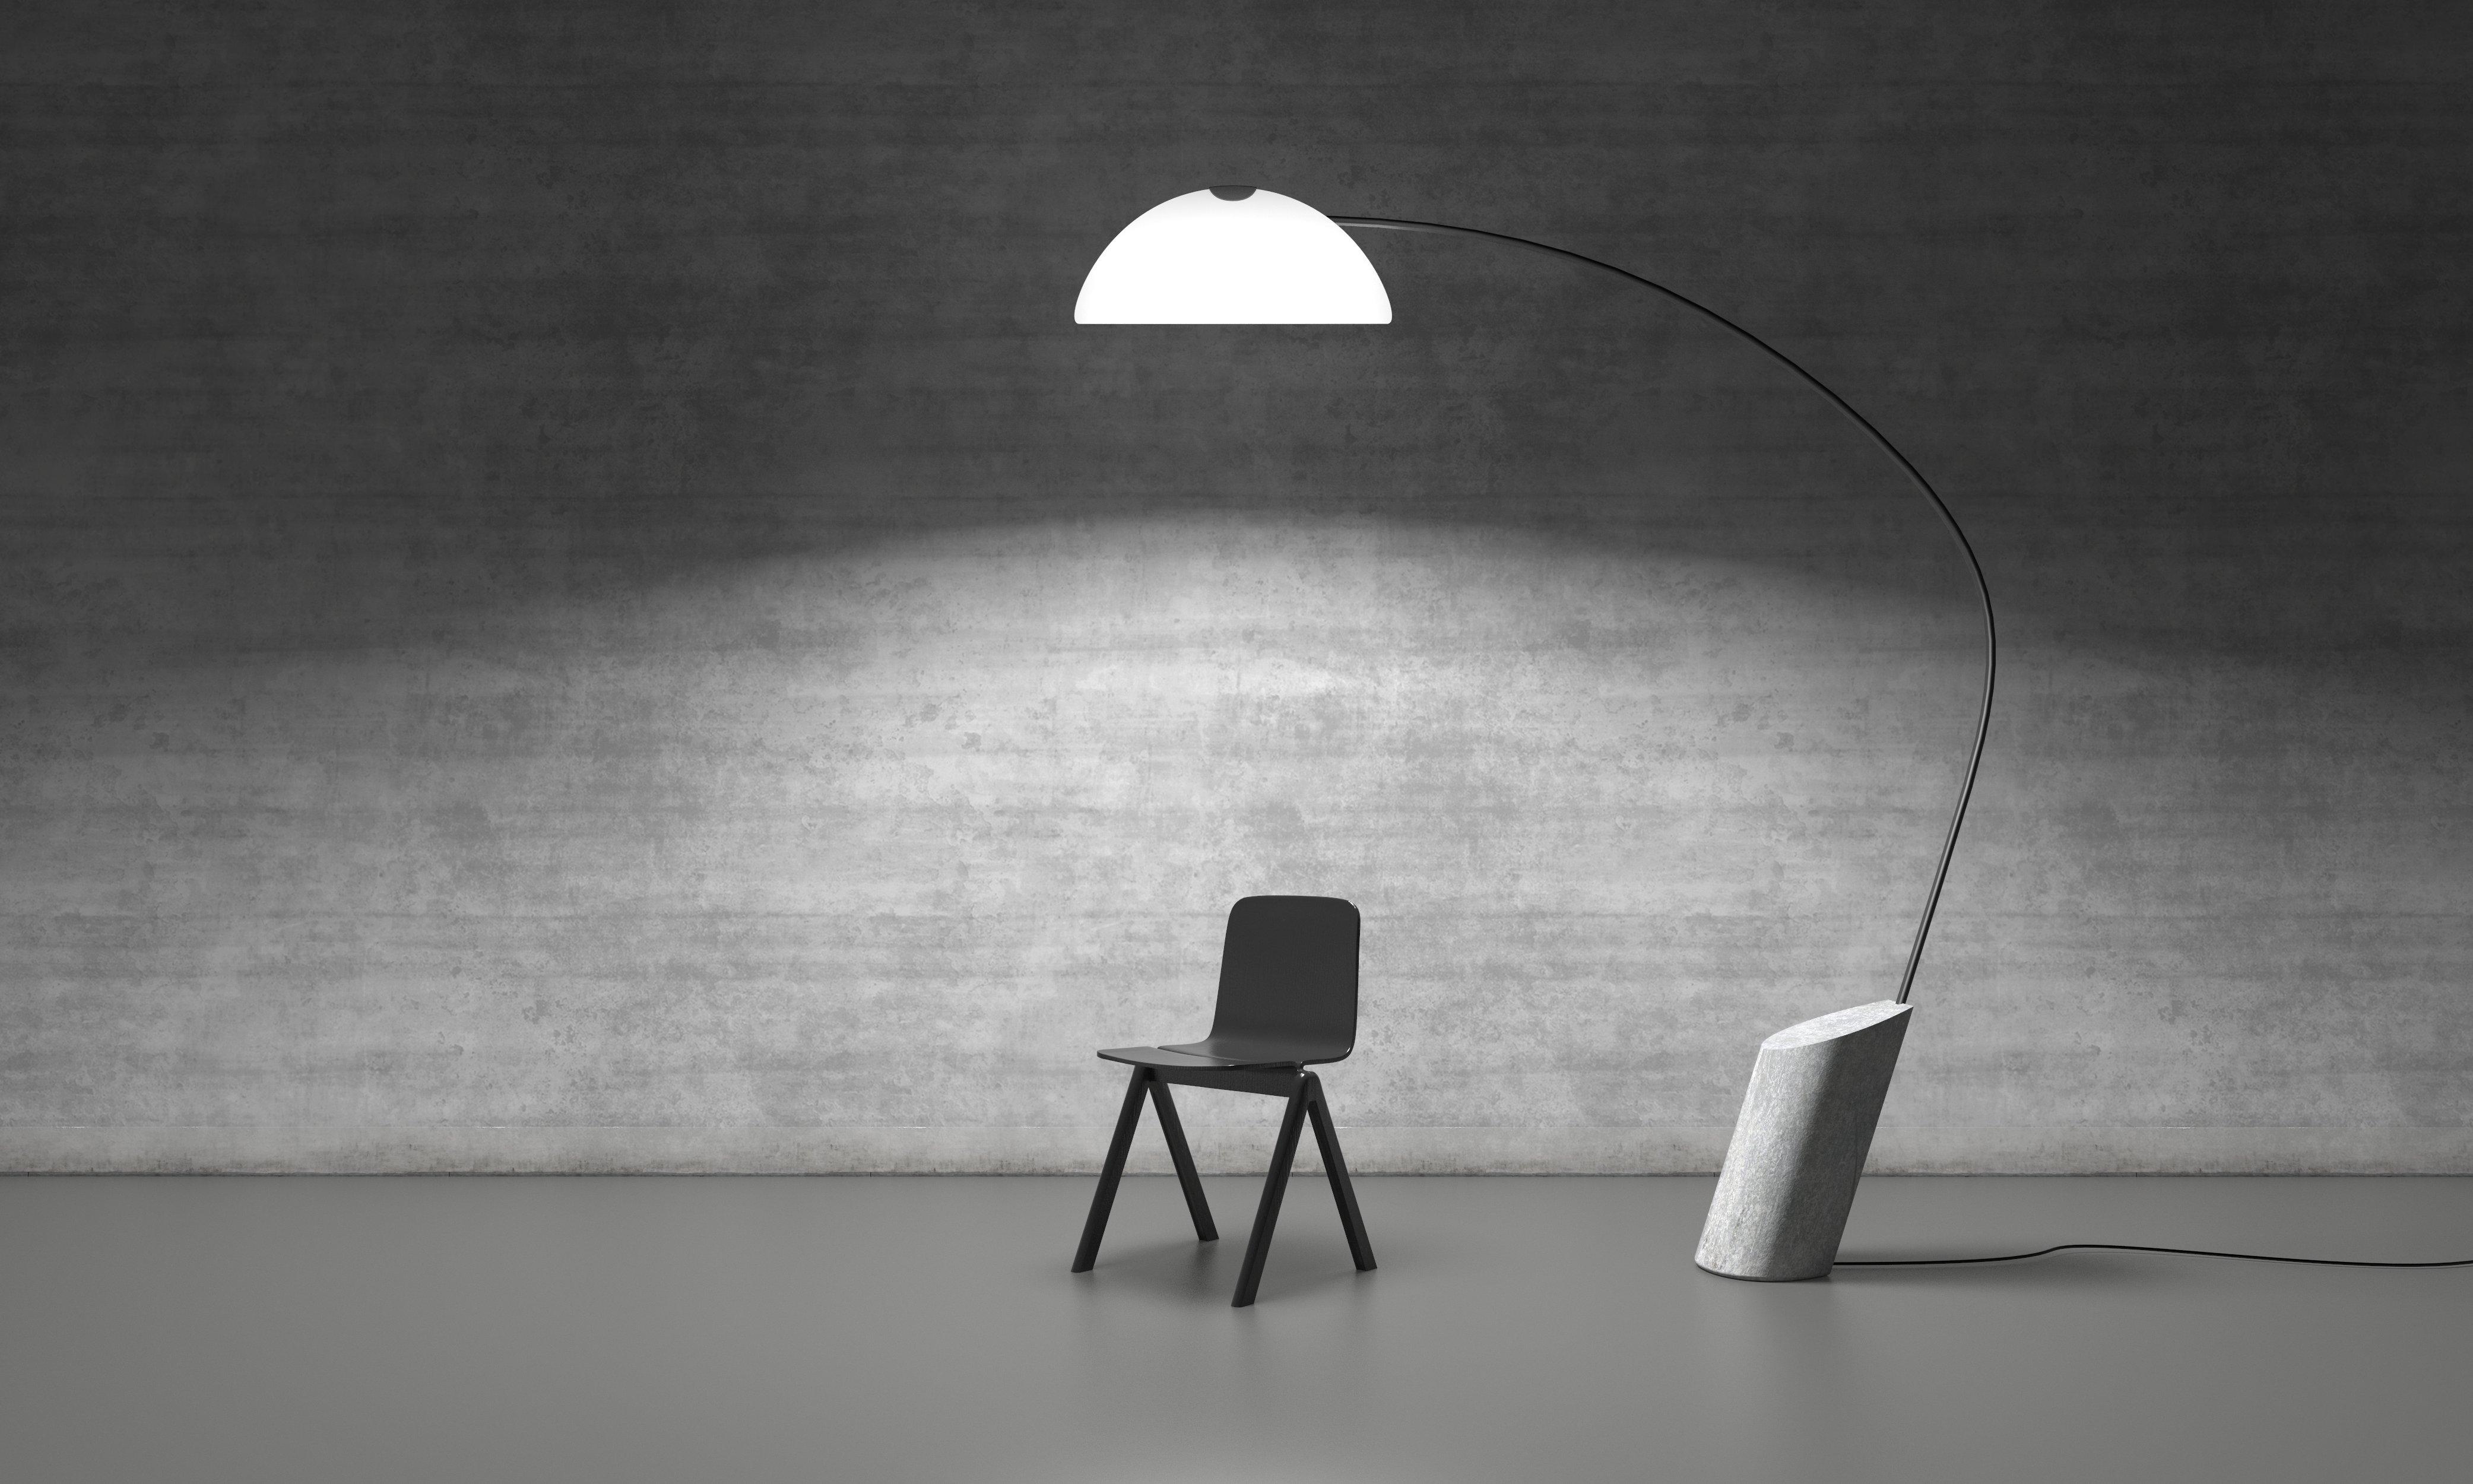 lampara pertiga diseño minimalista